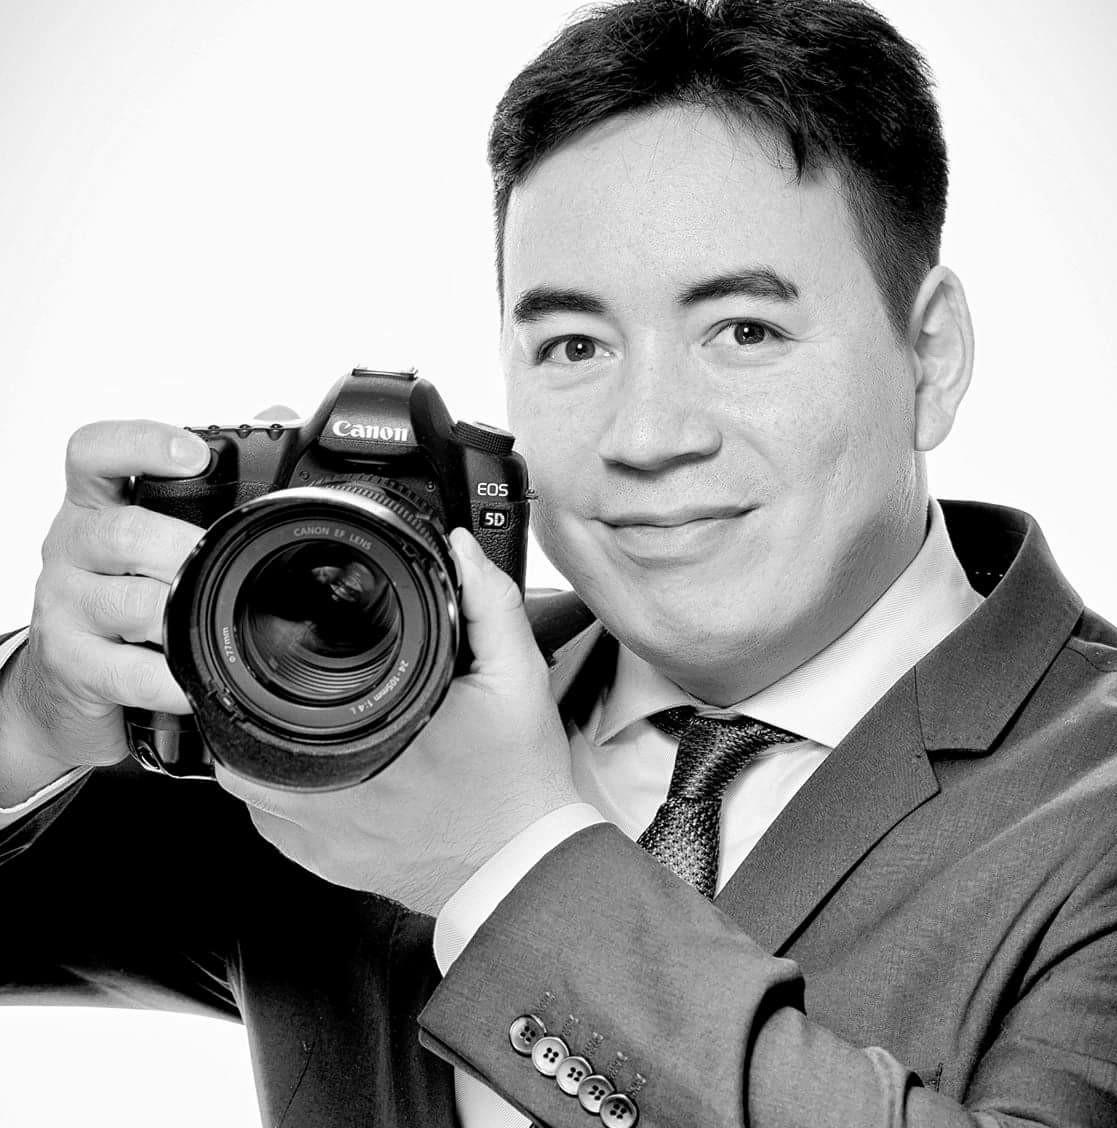 Hochzeitsfotograf Alexander Grosse-Strangmann